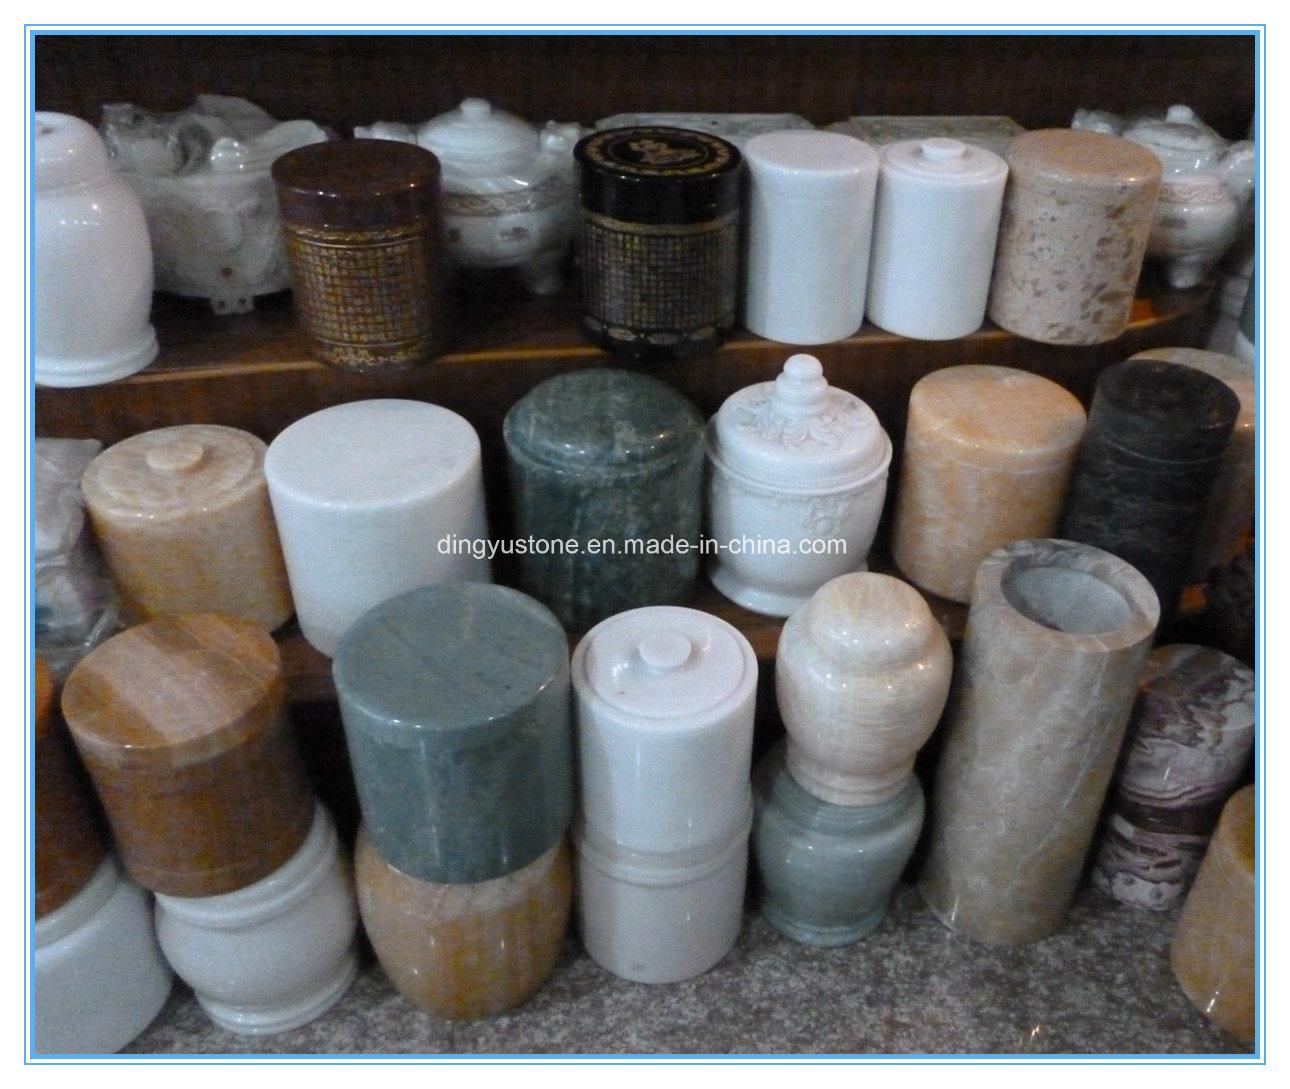 Granite Cremation Urns Burial Urns Memorial Urns Asher Urns Pet Urns for Graveyard